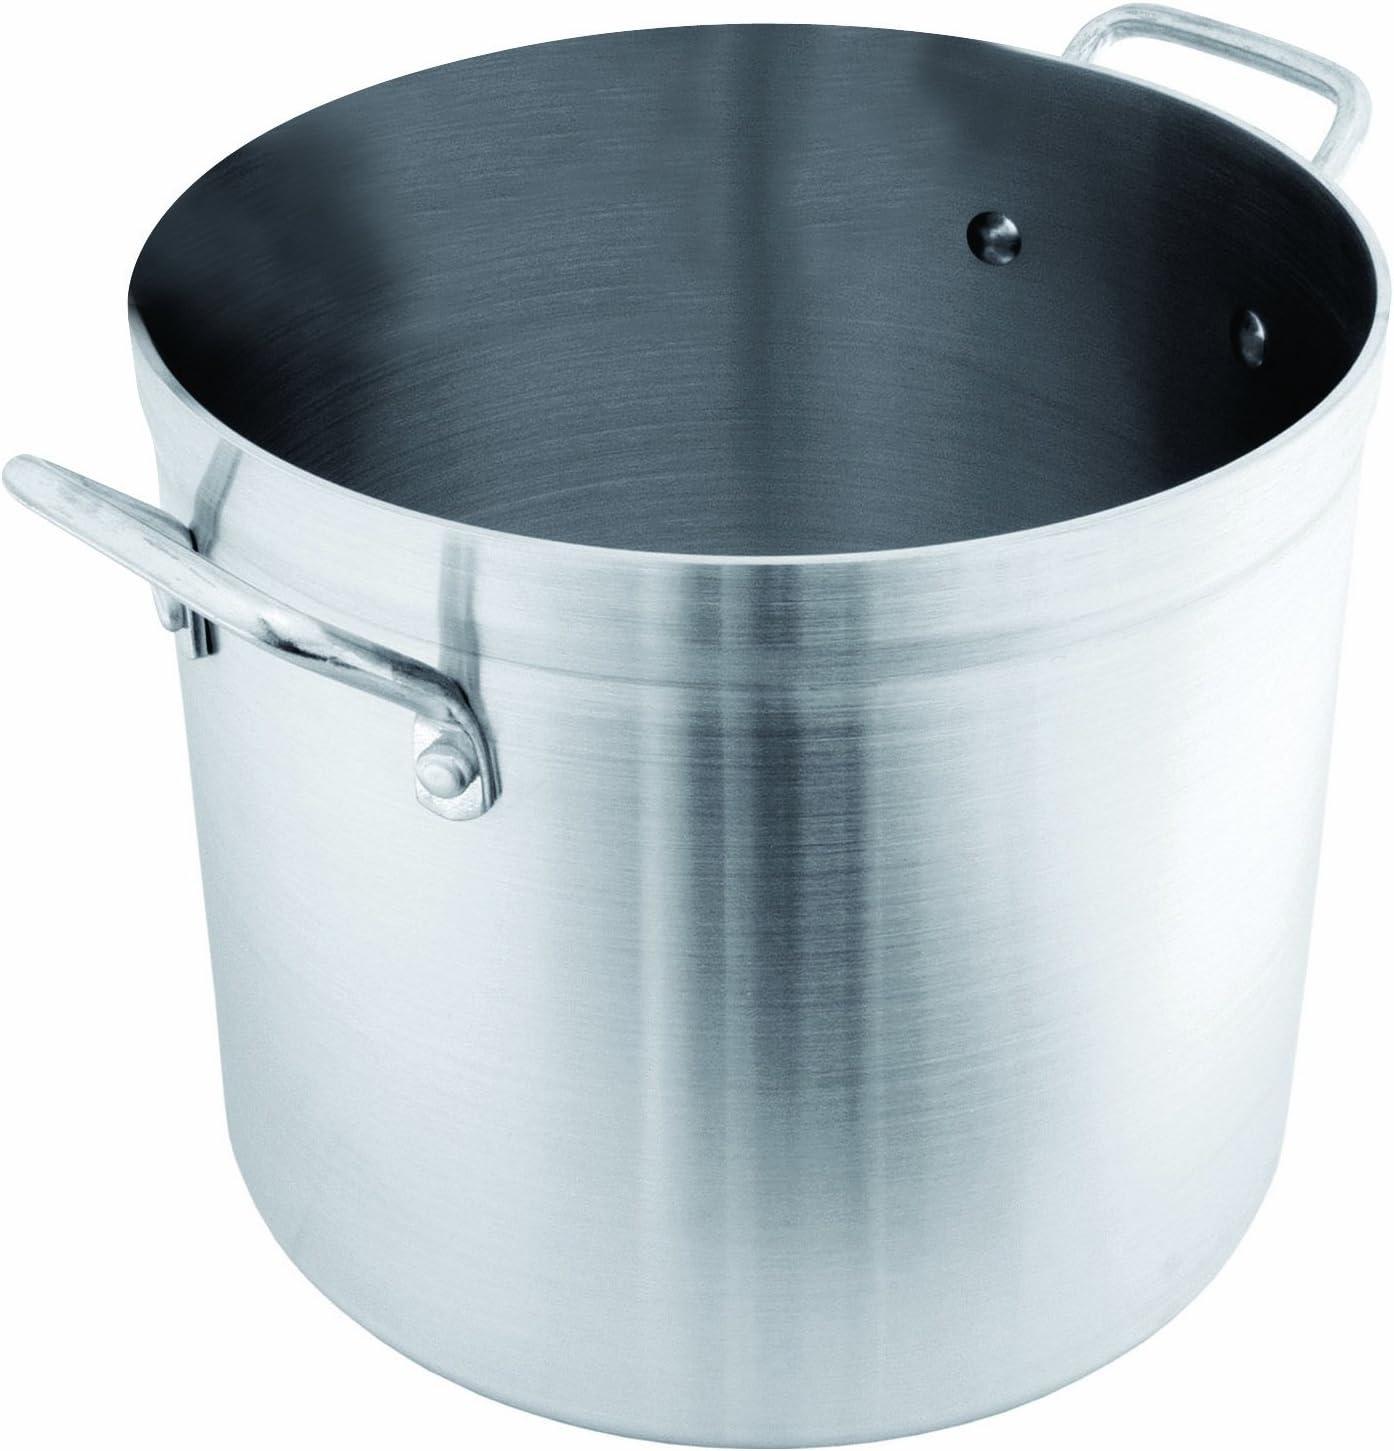 Crestware 16-Quart Our shop most popular Aluminum Stock Finally popular brand Pot